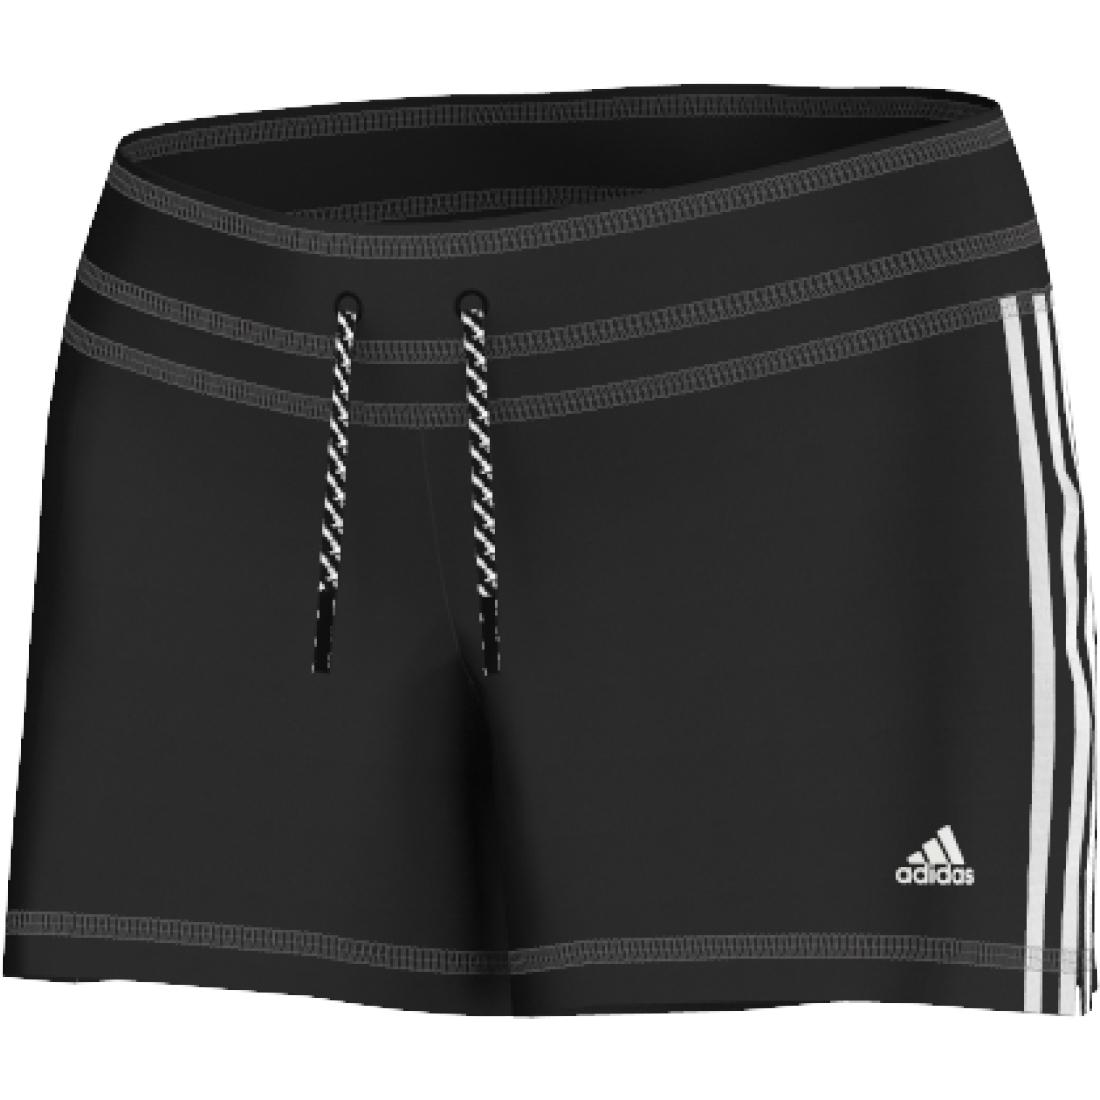 Image of   Adidas Essentials 3S Shorts